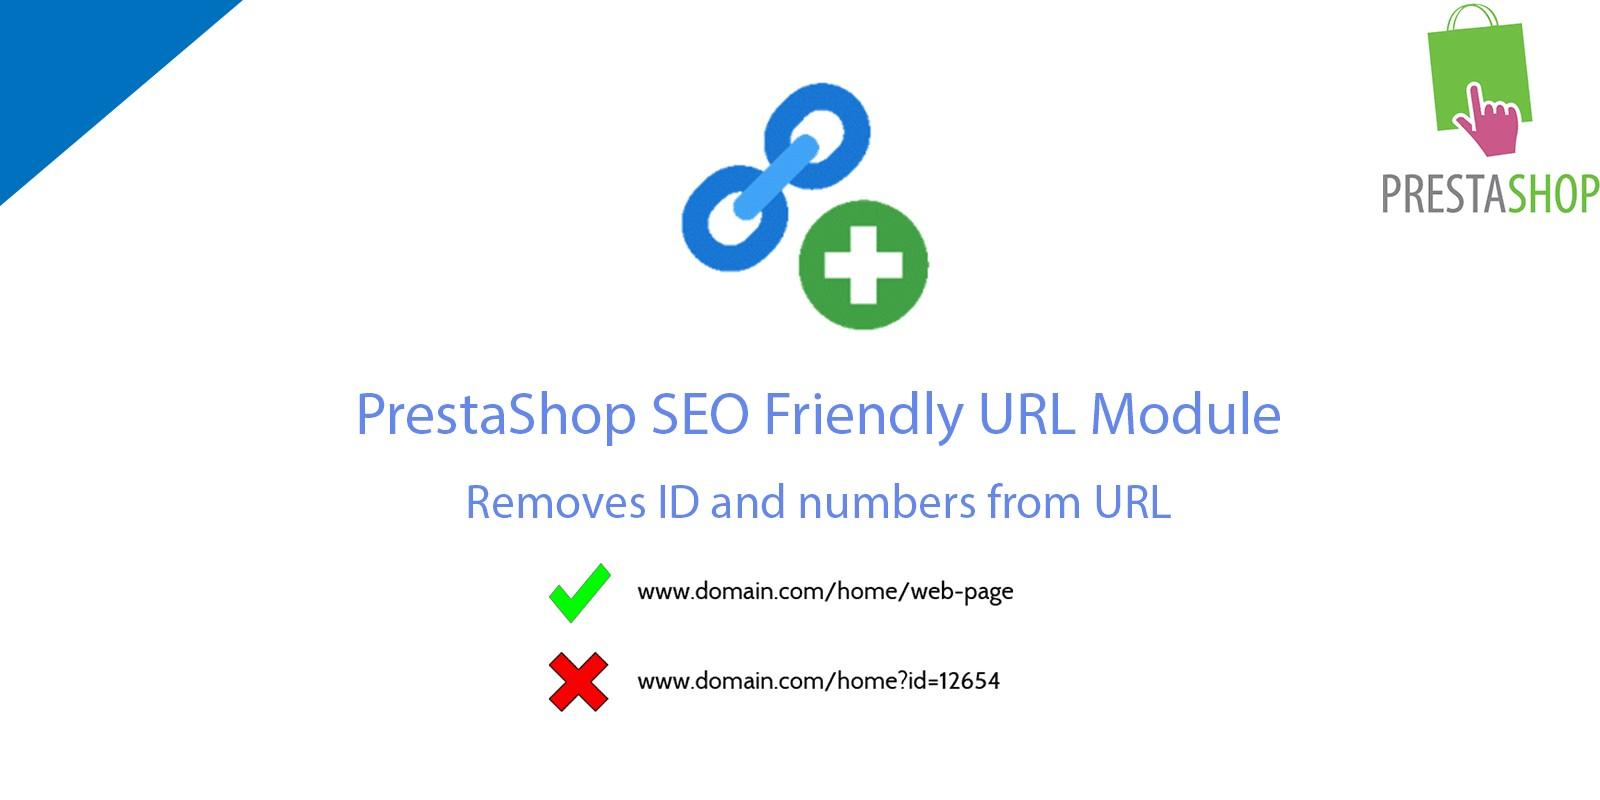 PrestaShop SEO Friendly URLs